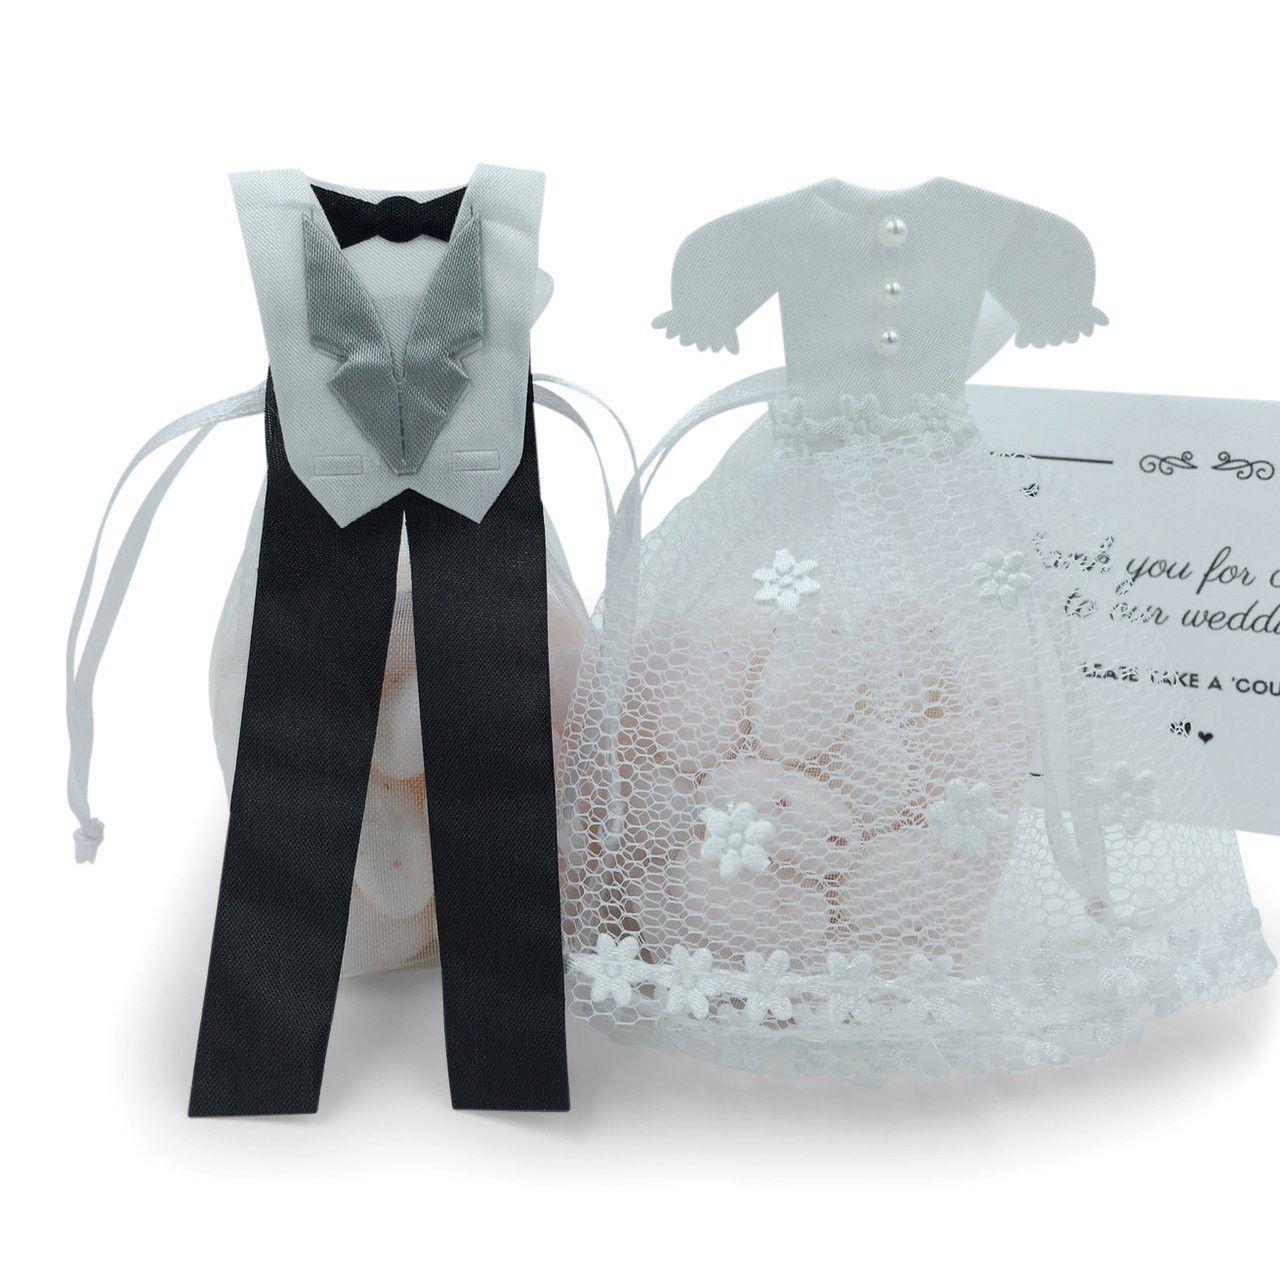 Bride & Groom Wedding Favor Bags - Thank You Gifts, 24 pcs   Wedding ...